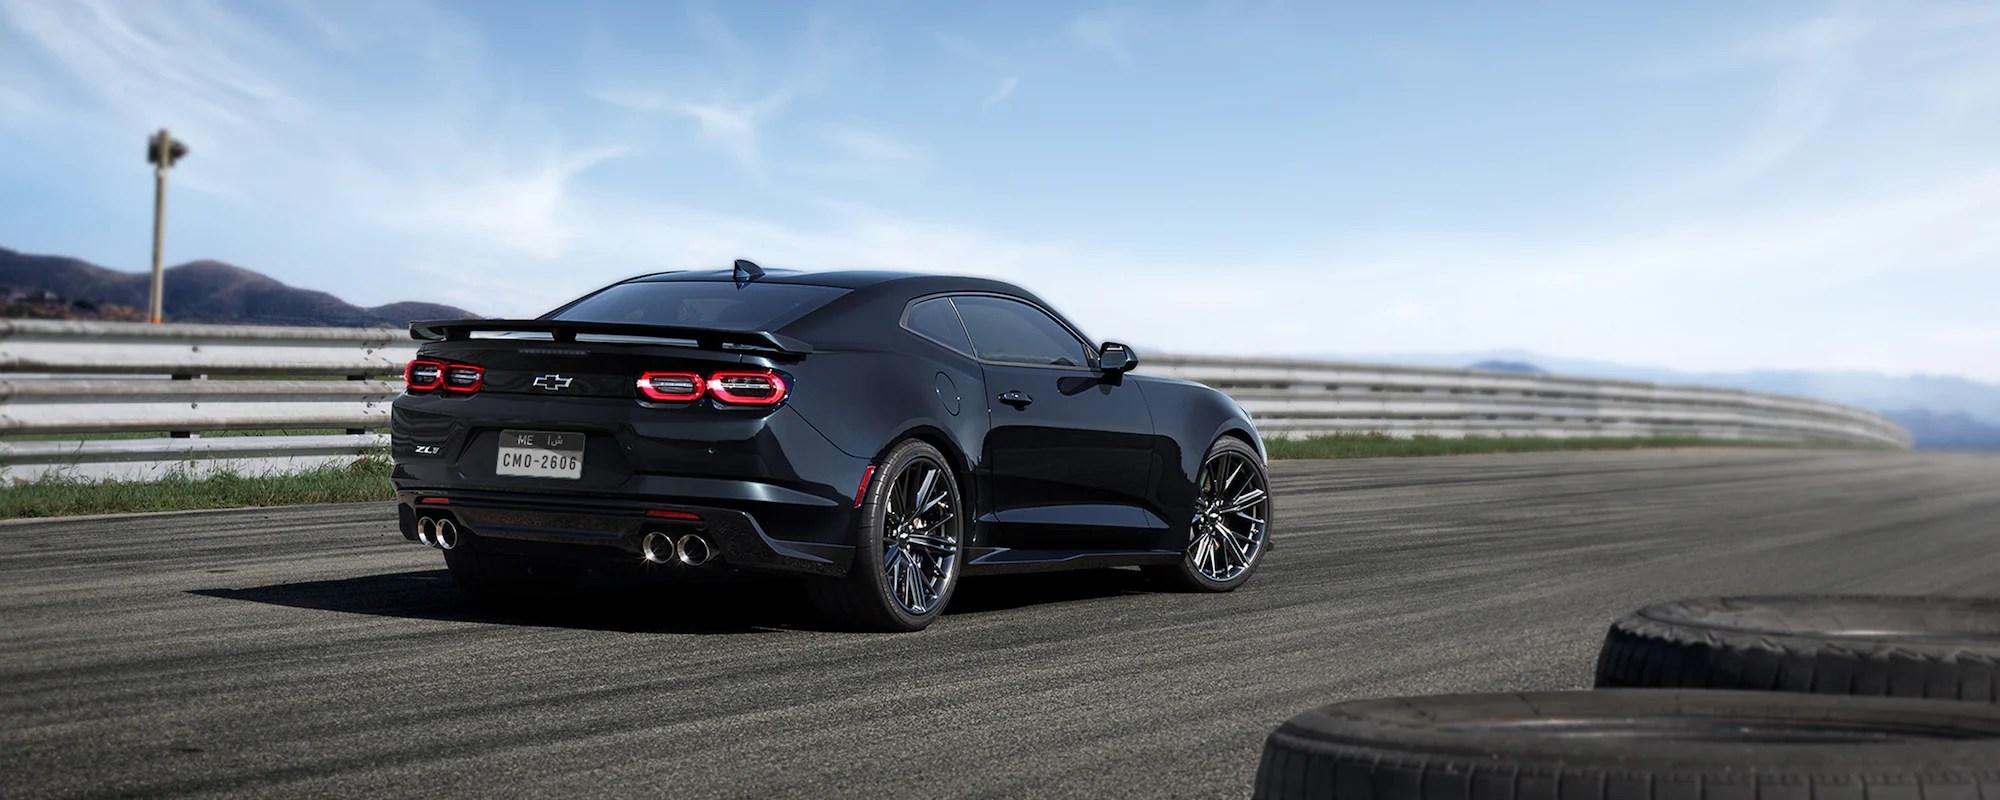 2020 camaro zl1 modern muscle car